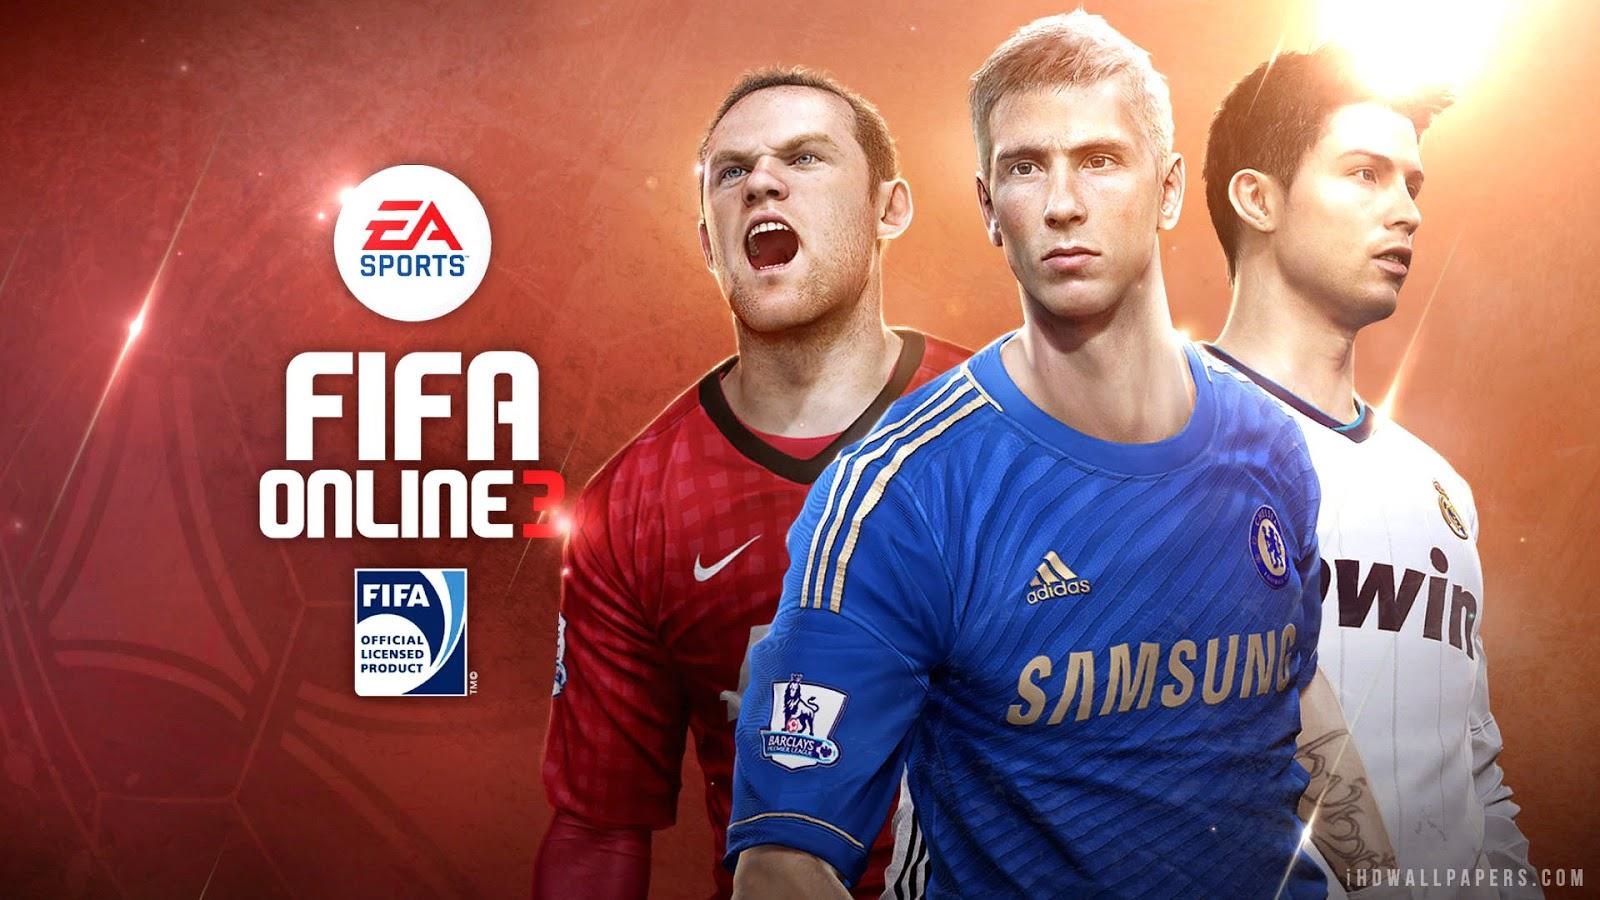 Fifa Online 3 Wallpaper